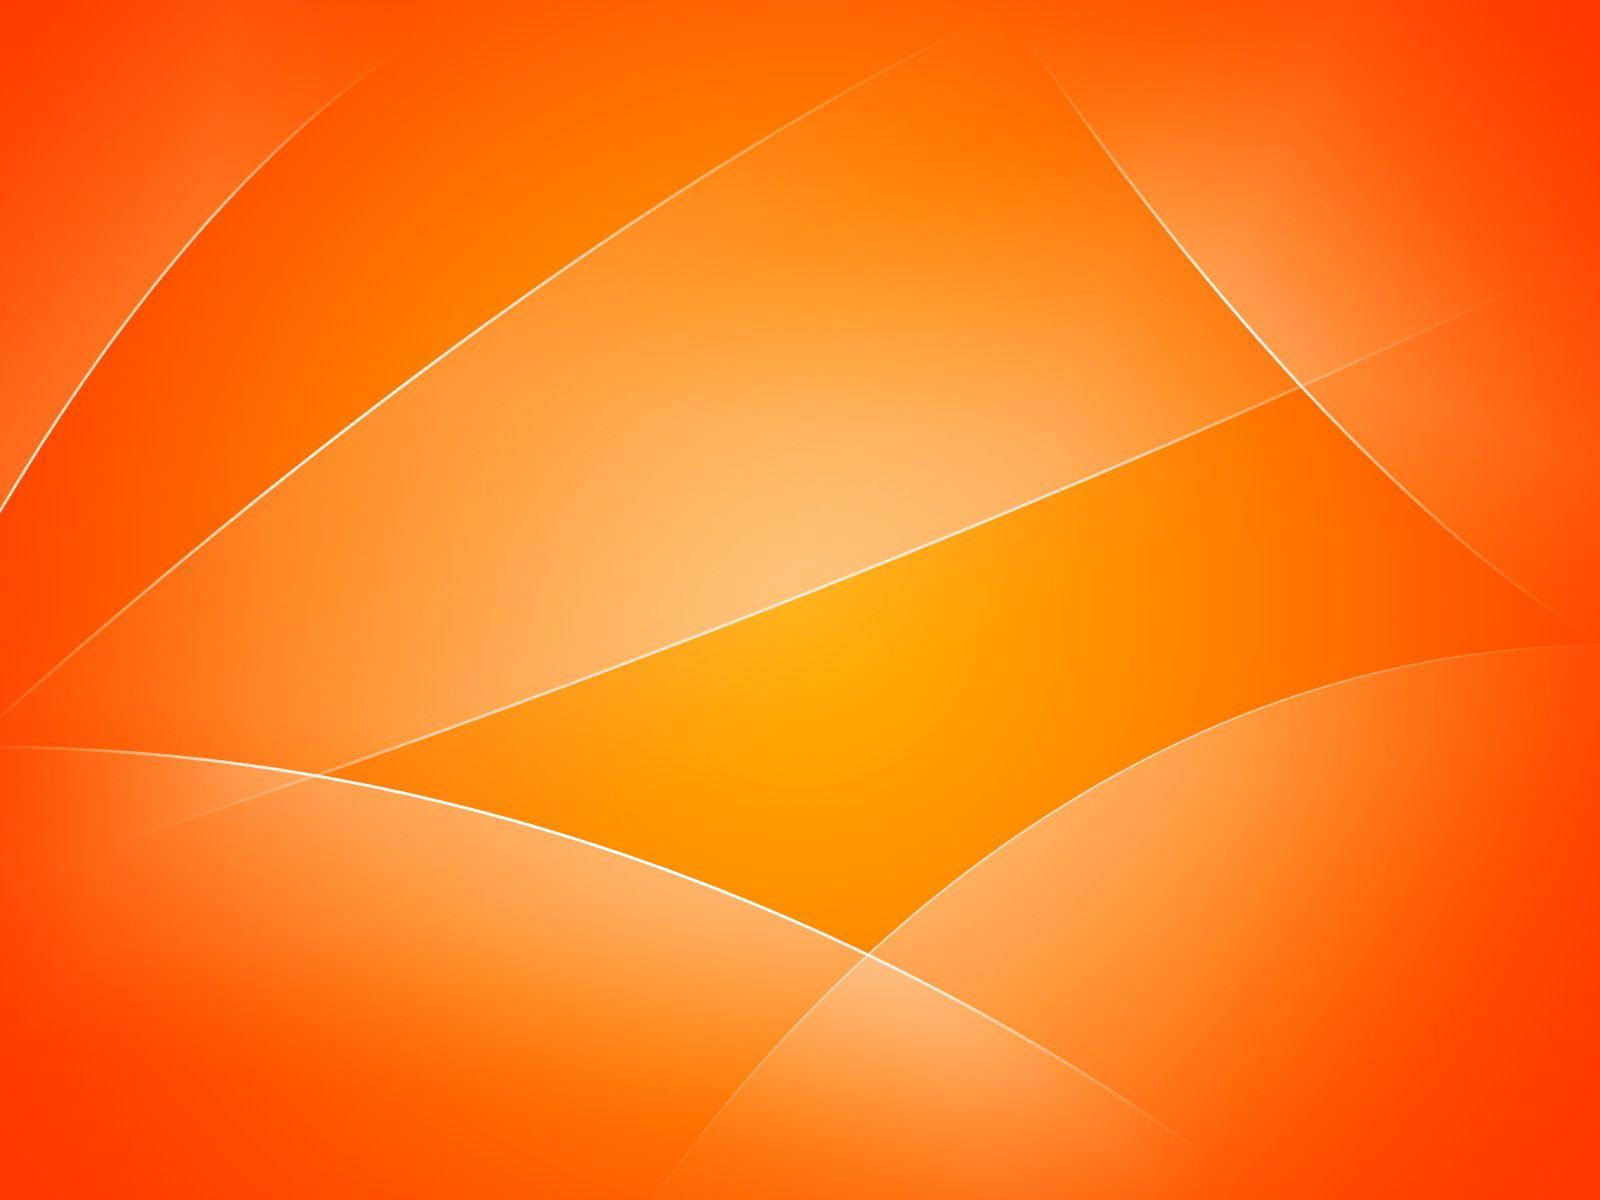 Cool Orange Backgrounds: Cool Orange Backgrounds HD